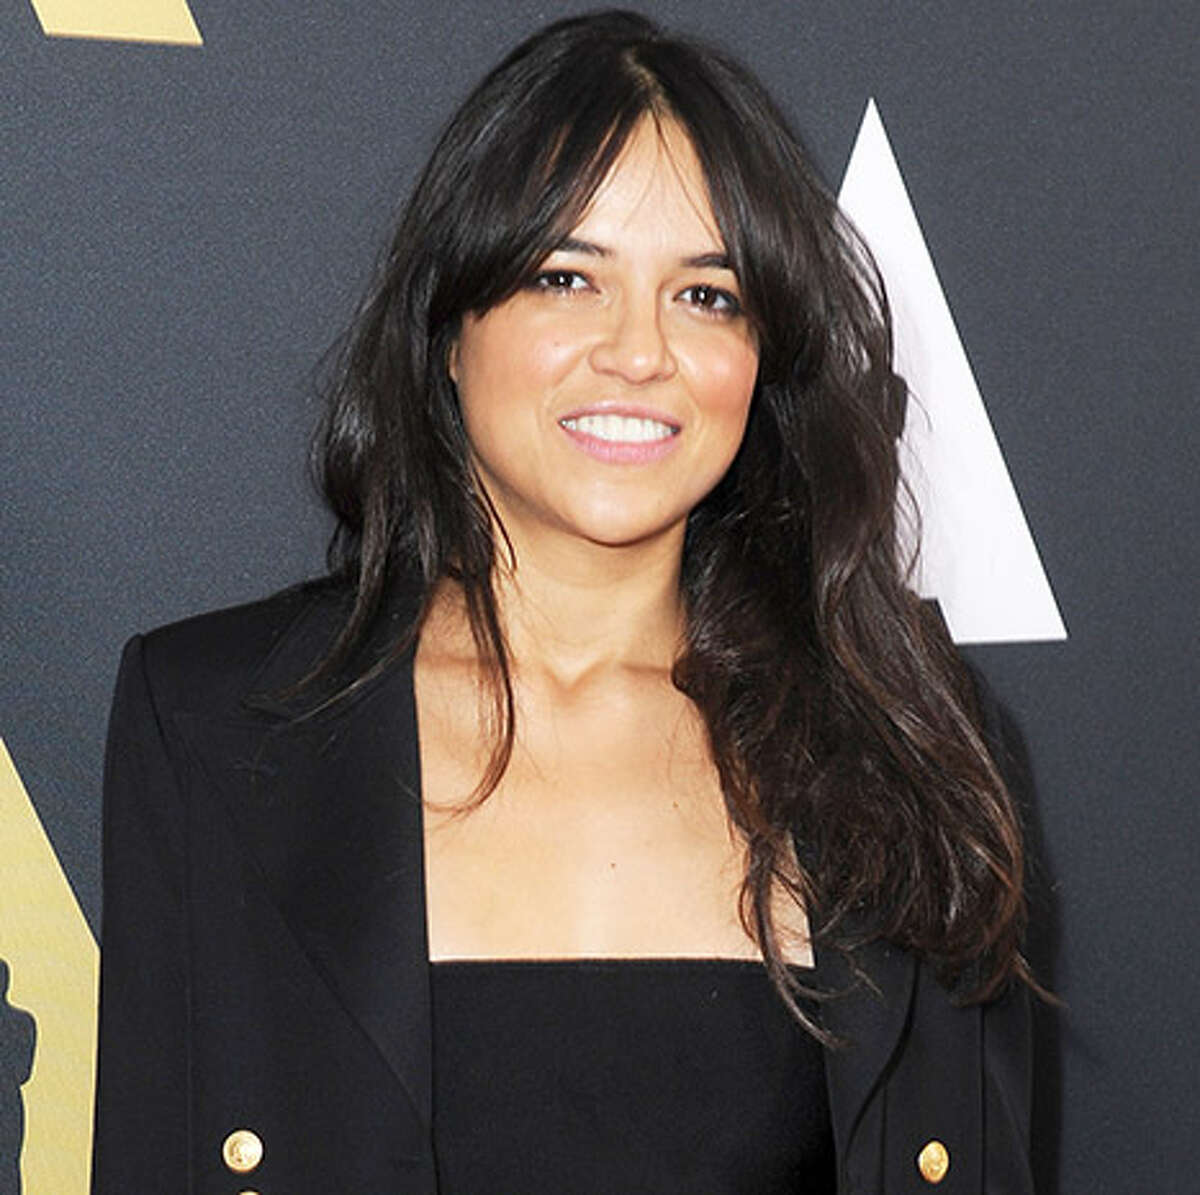 Michelle Rodriguez,actor